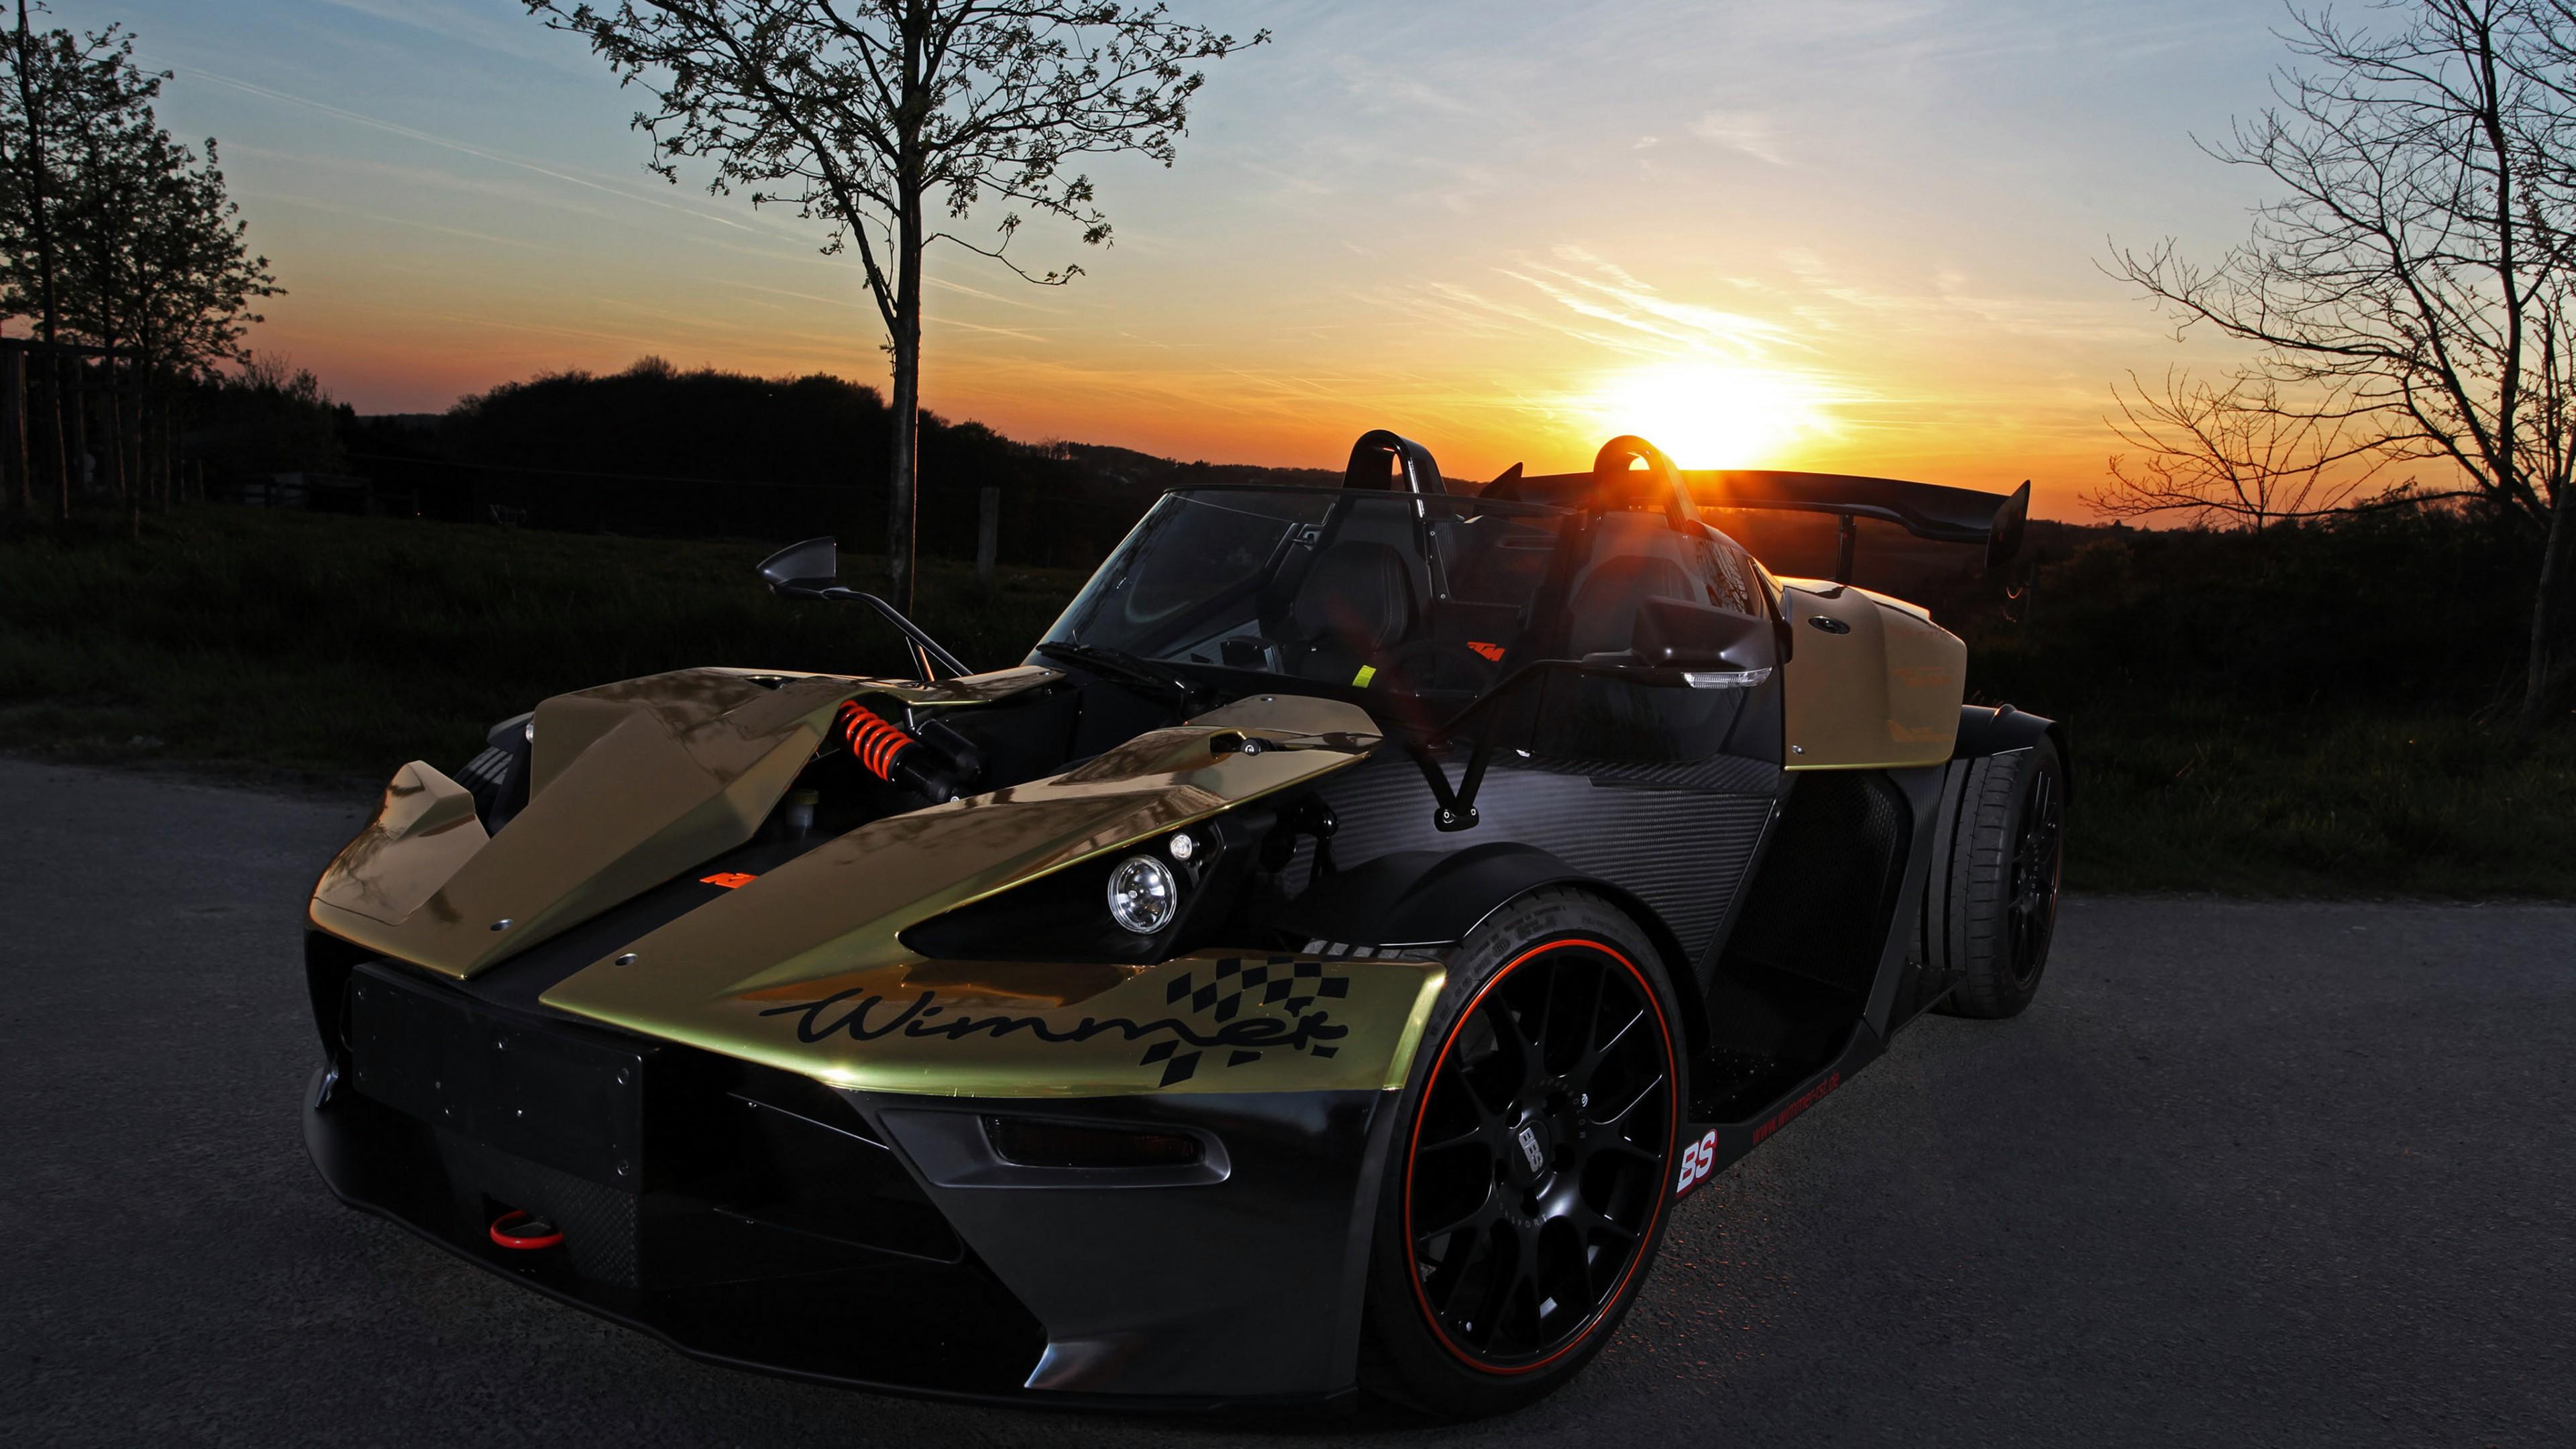 Wallpaper Wimmer Rs Ktm X Bow Gt Dubai Sport Car Black Cars